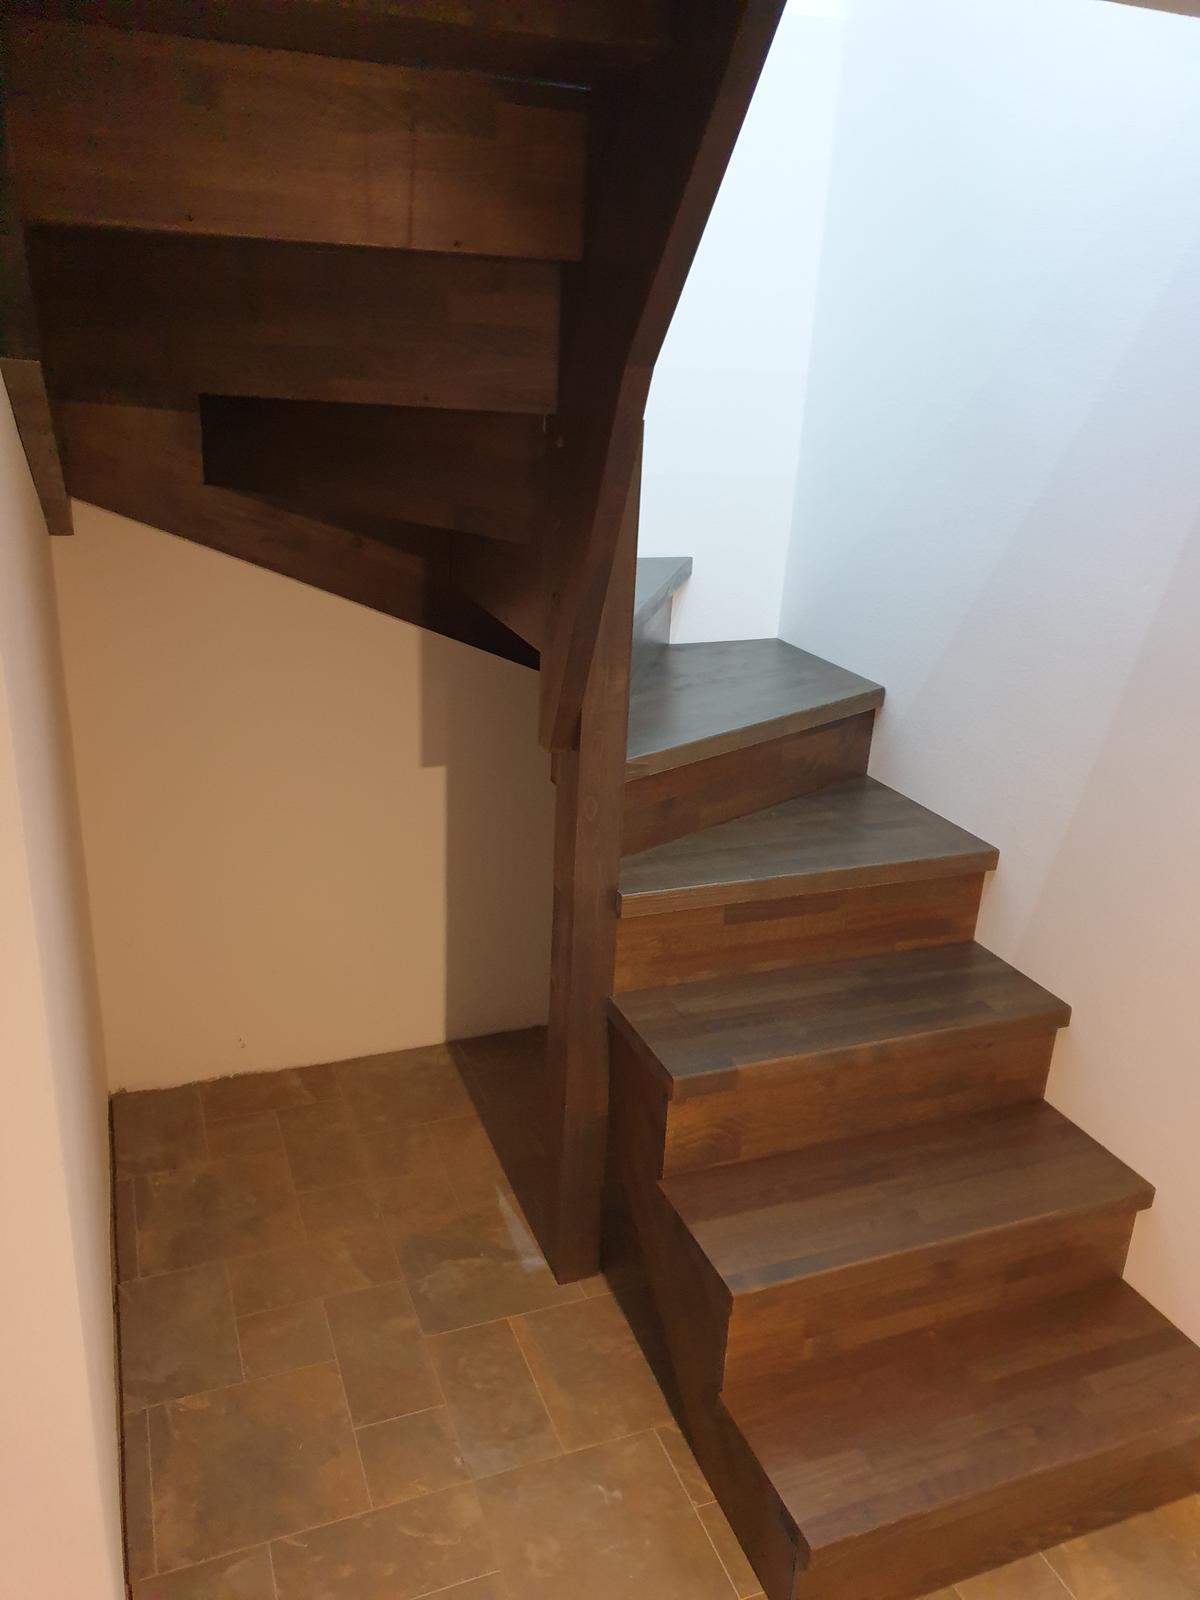 Konzolové schody - BUK, DUB - Obrázok č. 29